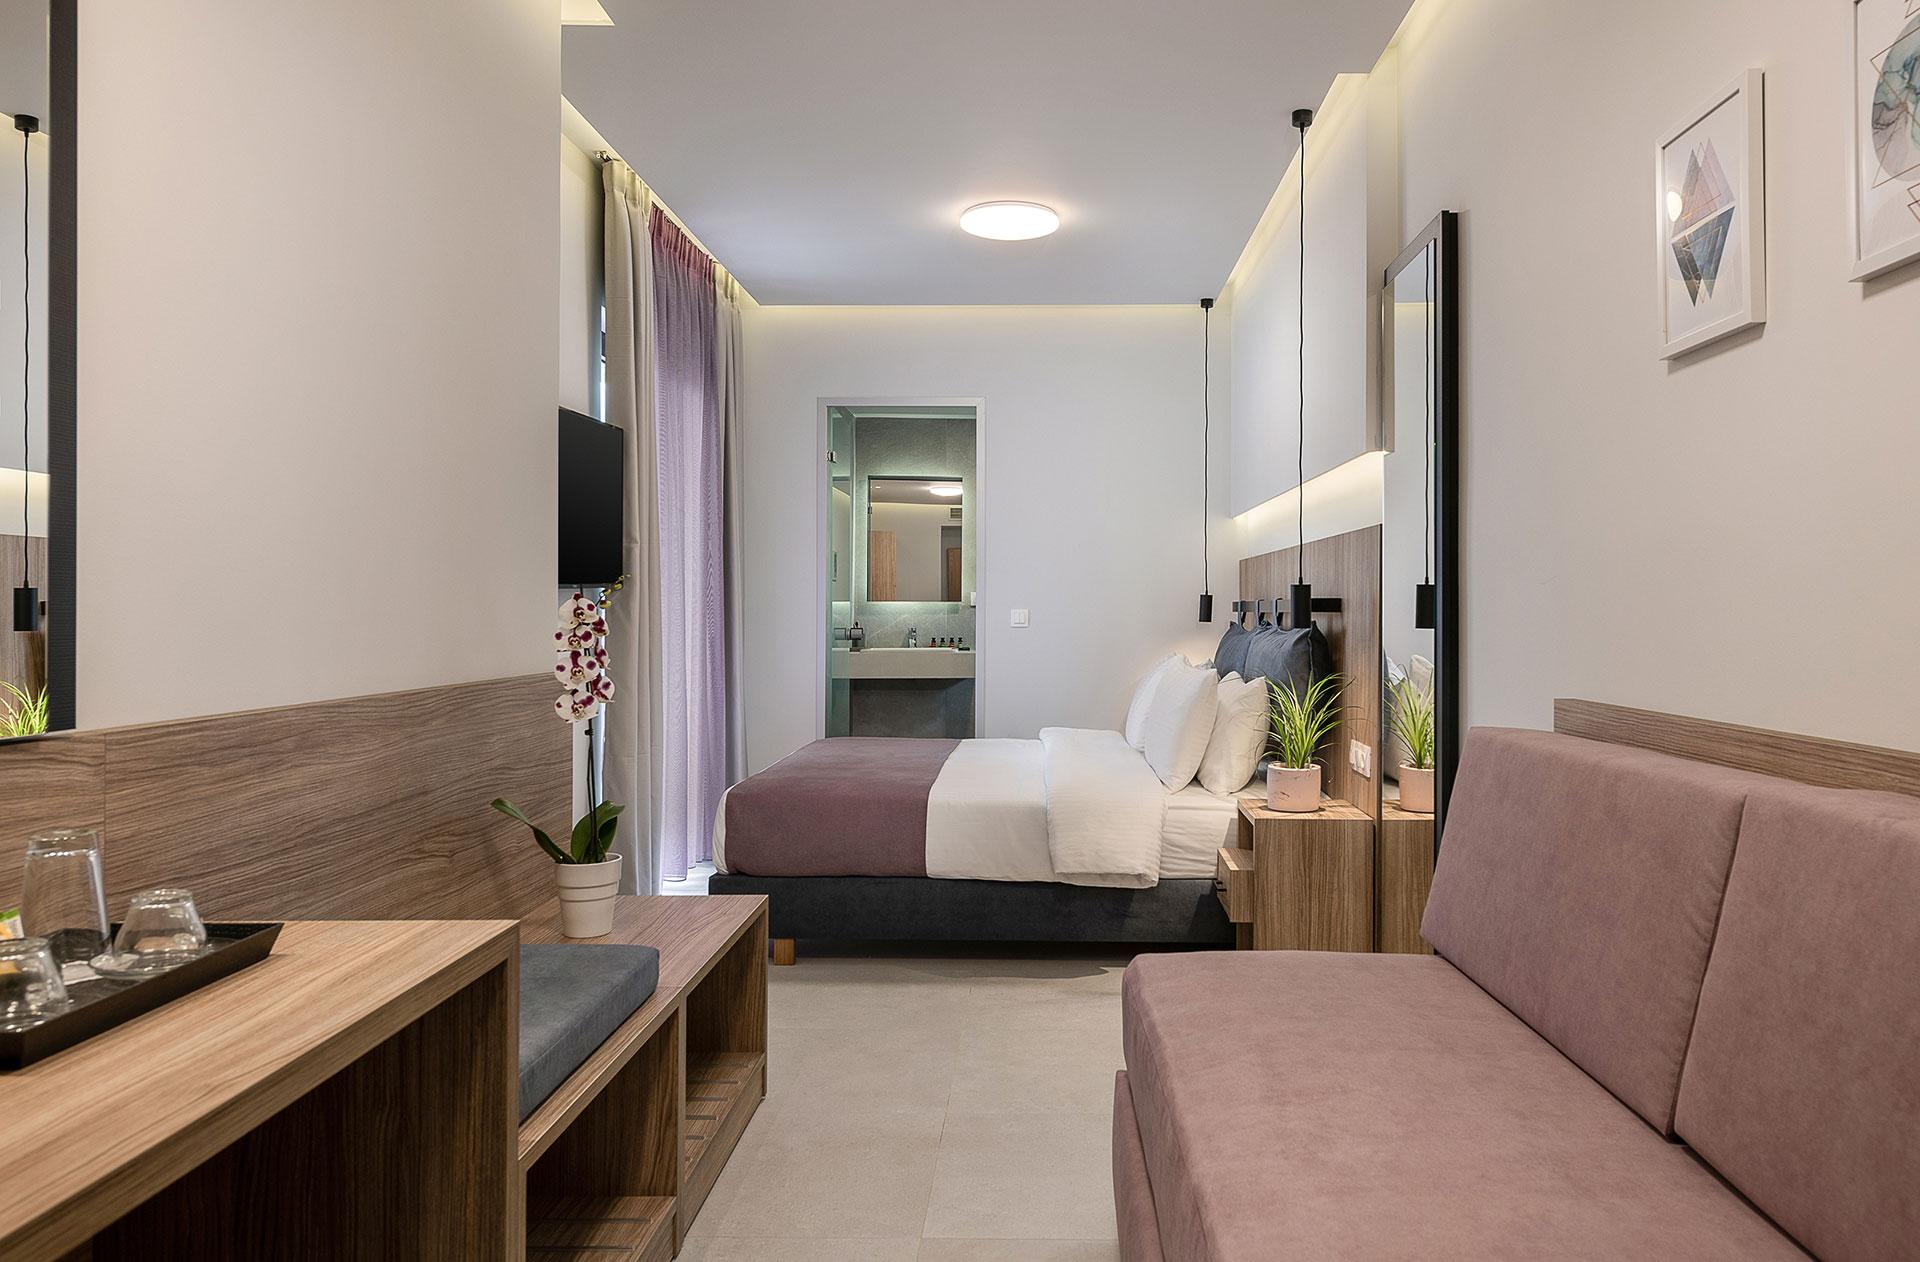 Morum Hotels & Apts